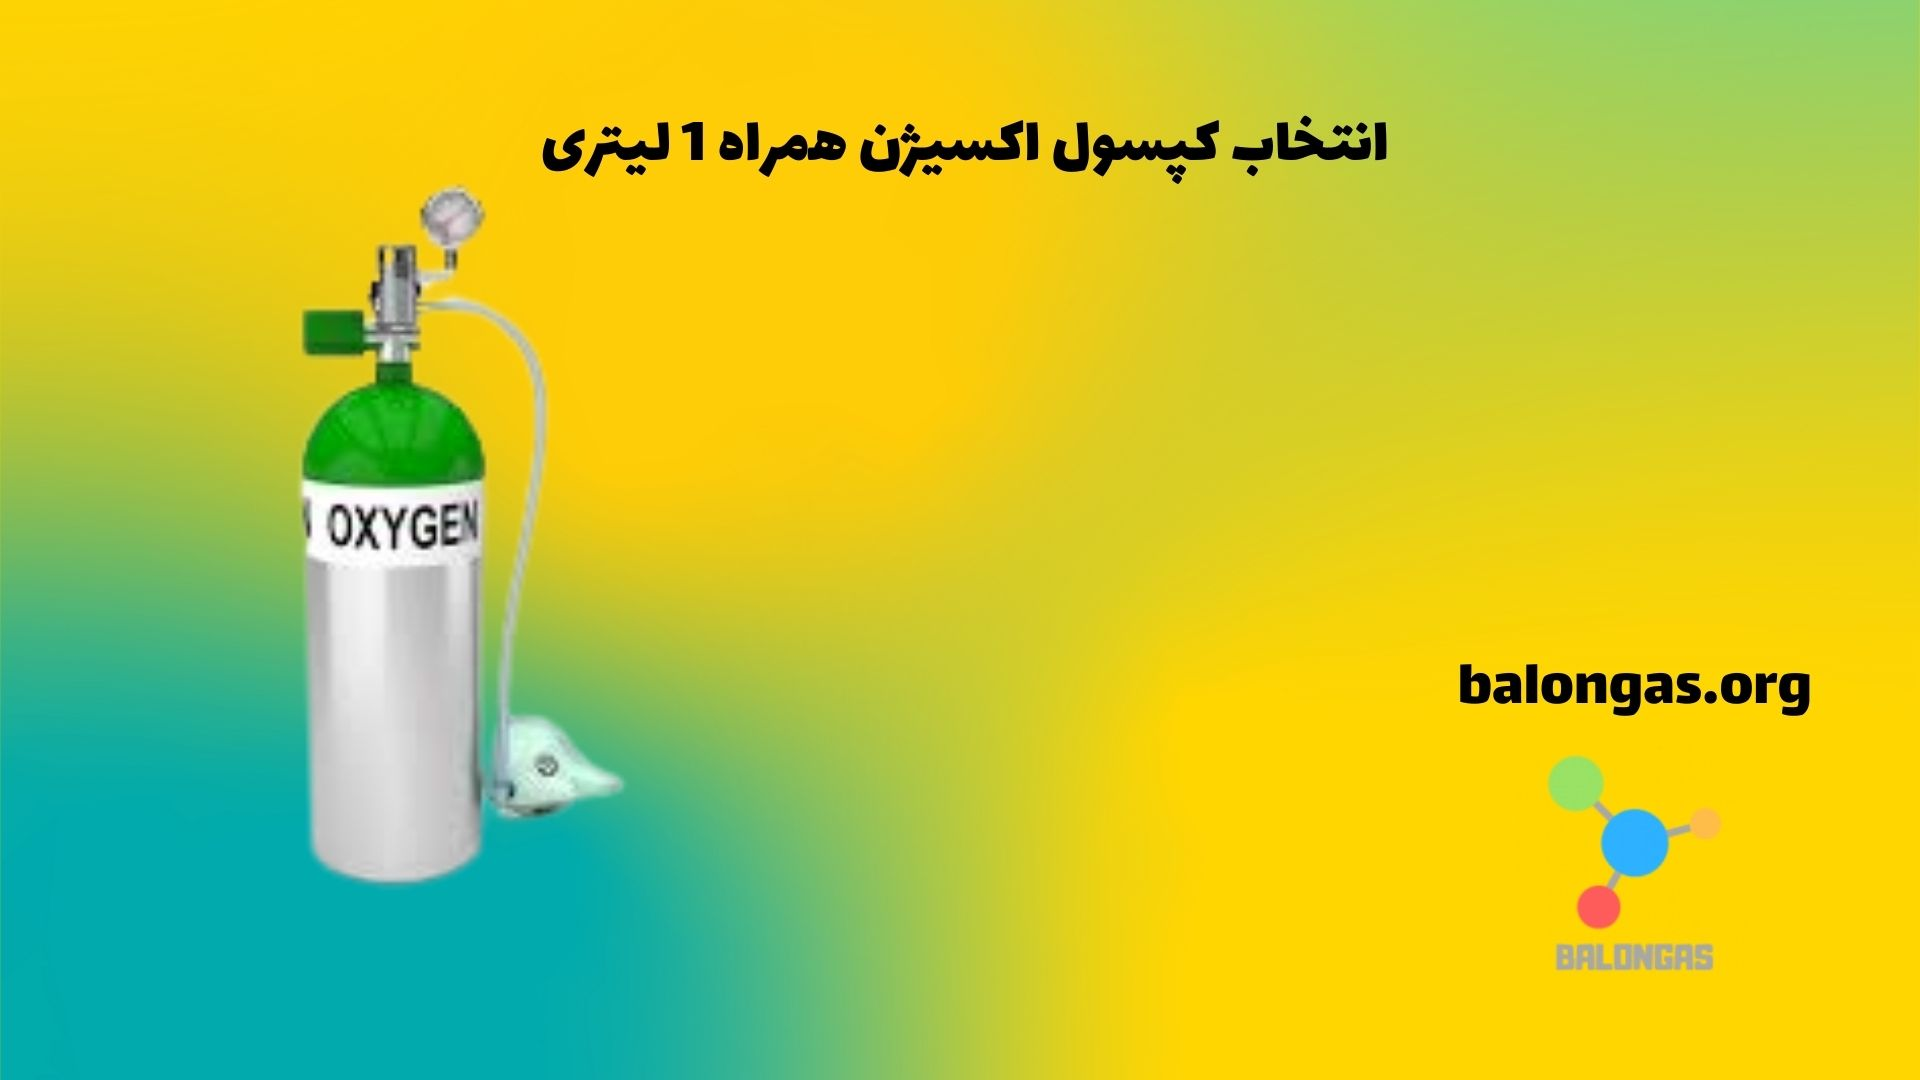 انتخاب کپسول اکسیژن همراه 1 لیتری